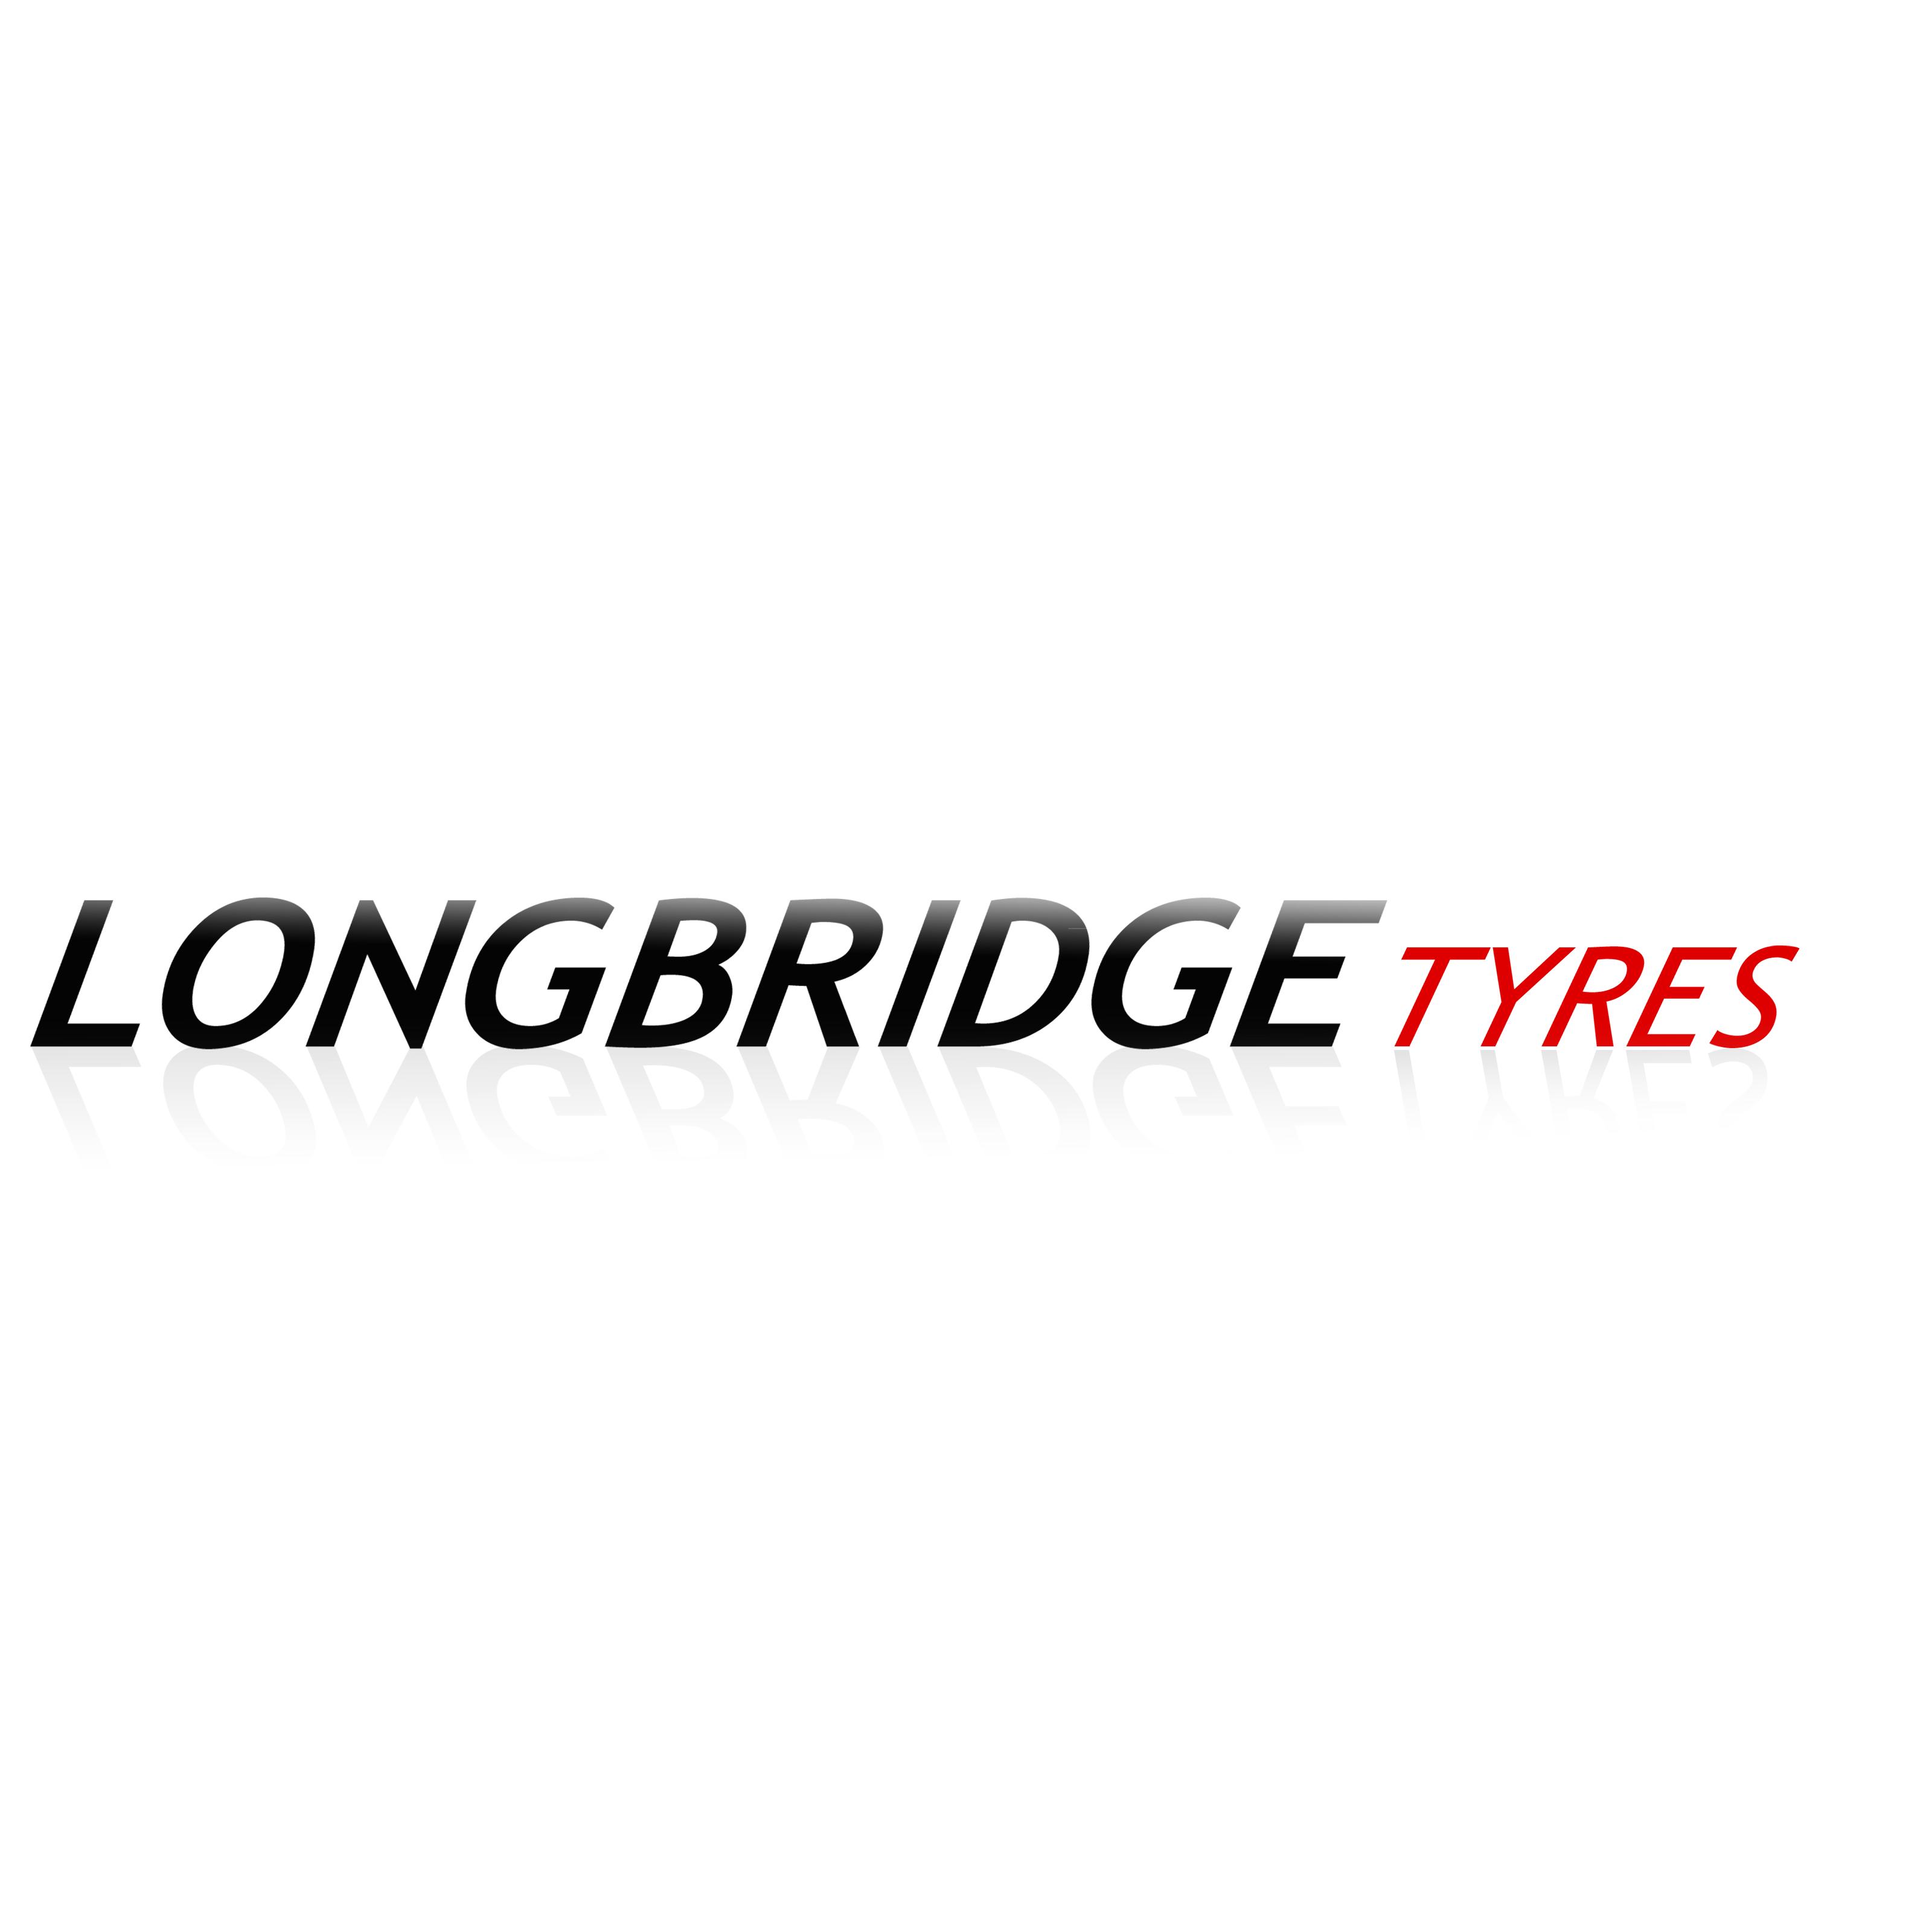 Longbridge Tyres - Birmingham, West Midlands B45 9UA - 01214 577582 | ShowMeLocal.com